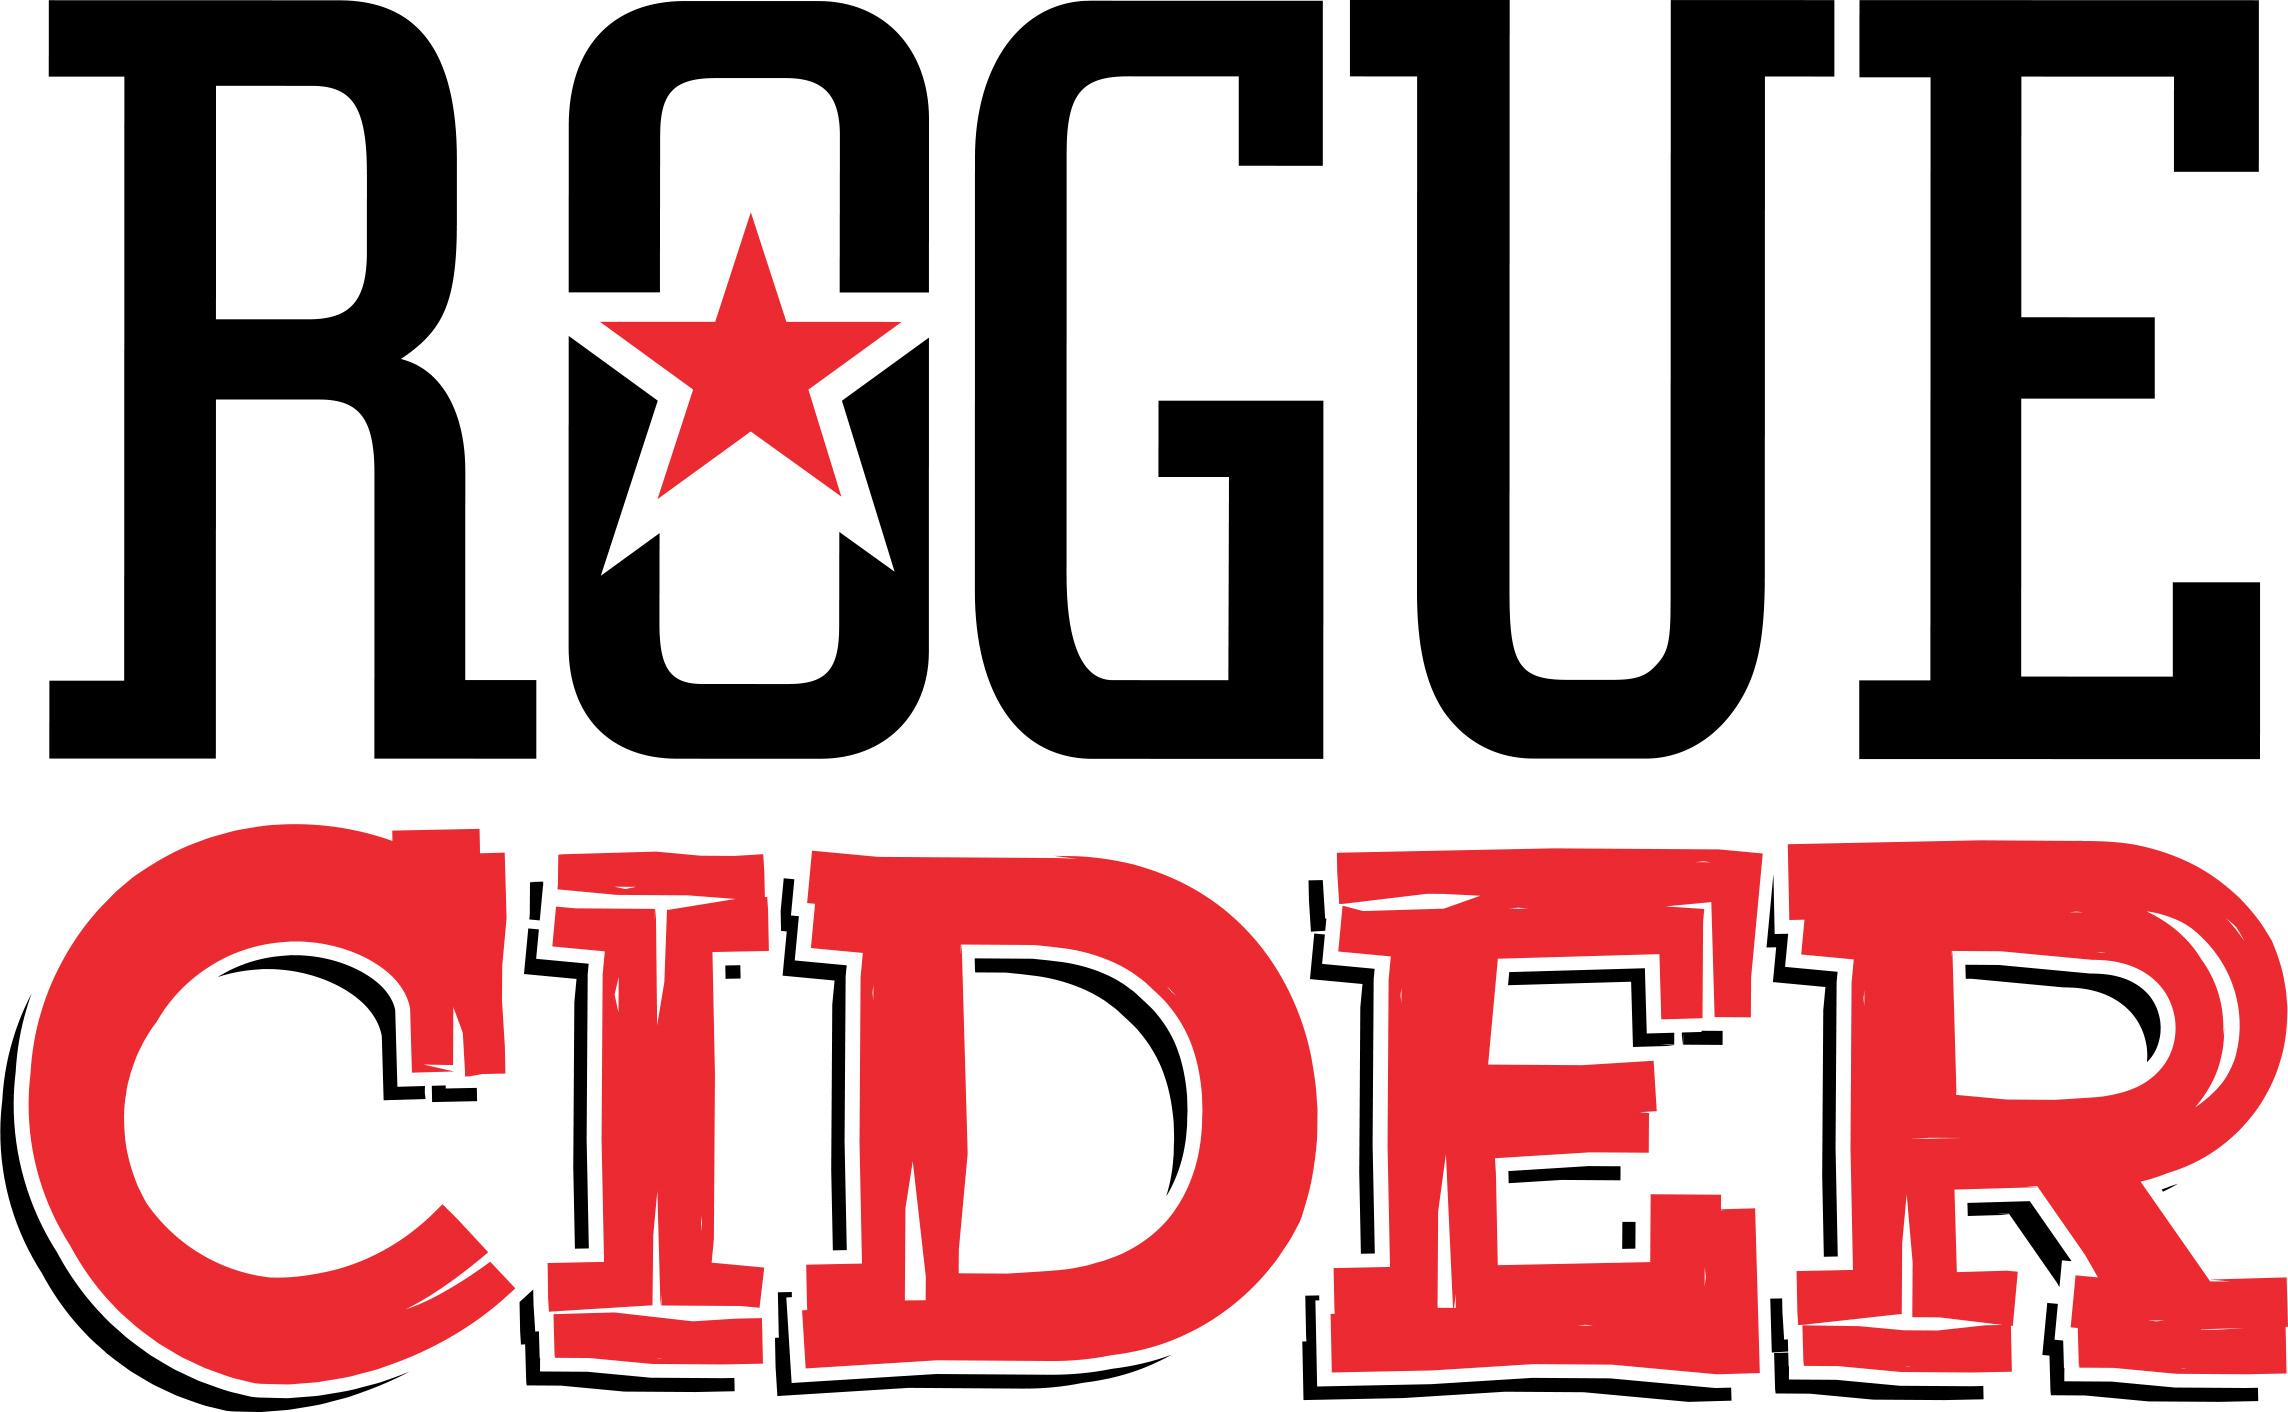 Rogue_Cider_Logo